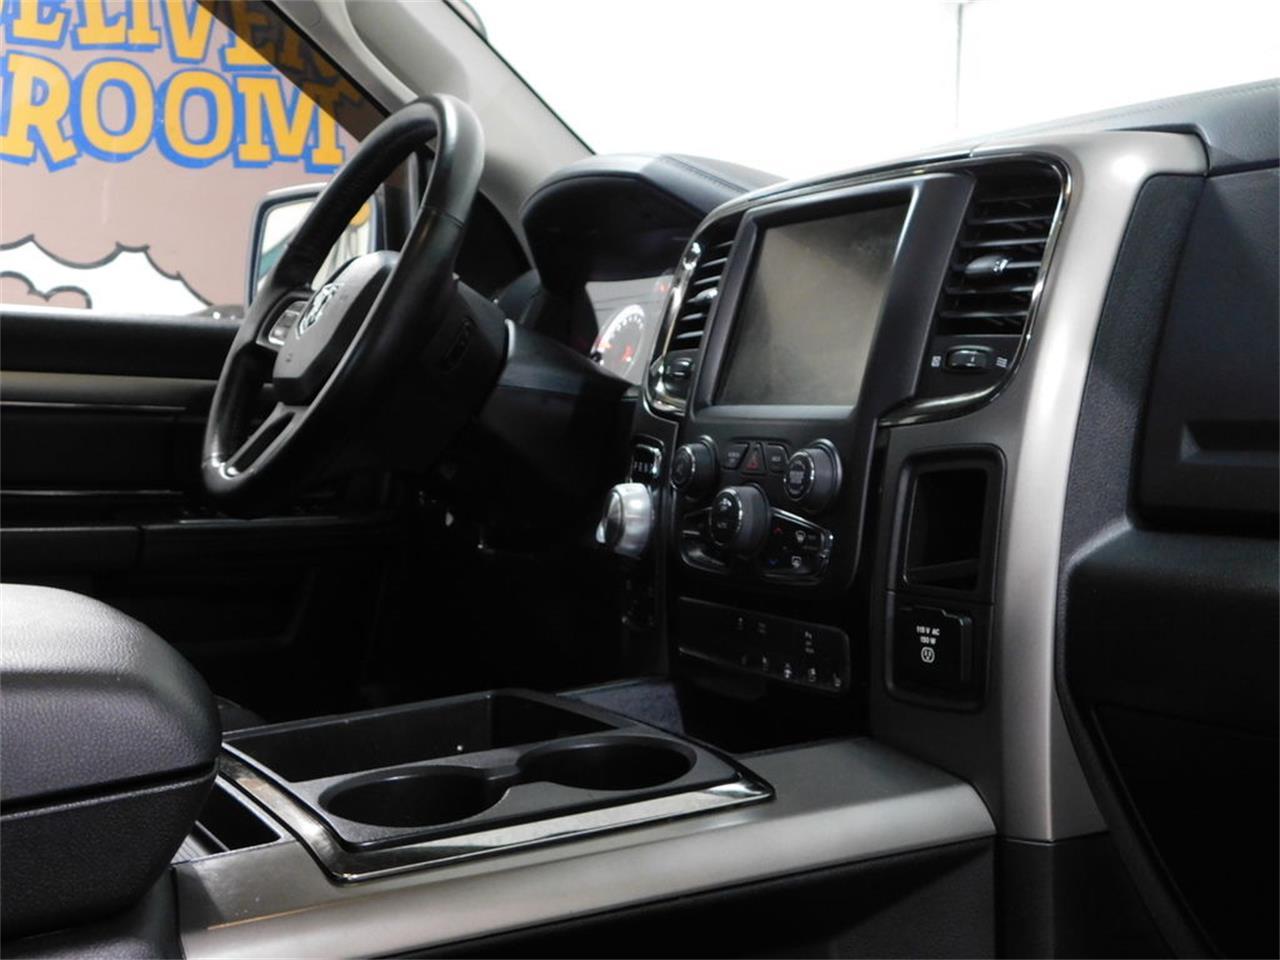 2014 Dodge Ram 1500 (CC-1385755) for sale in Hamburg, New York